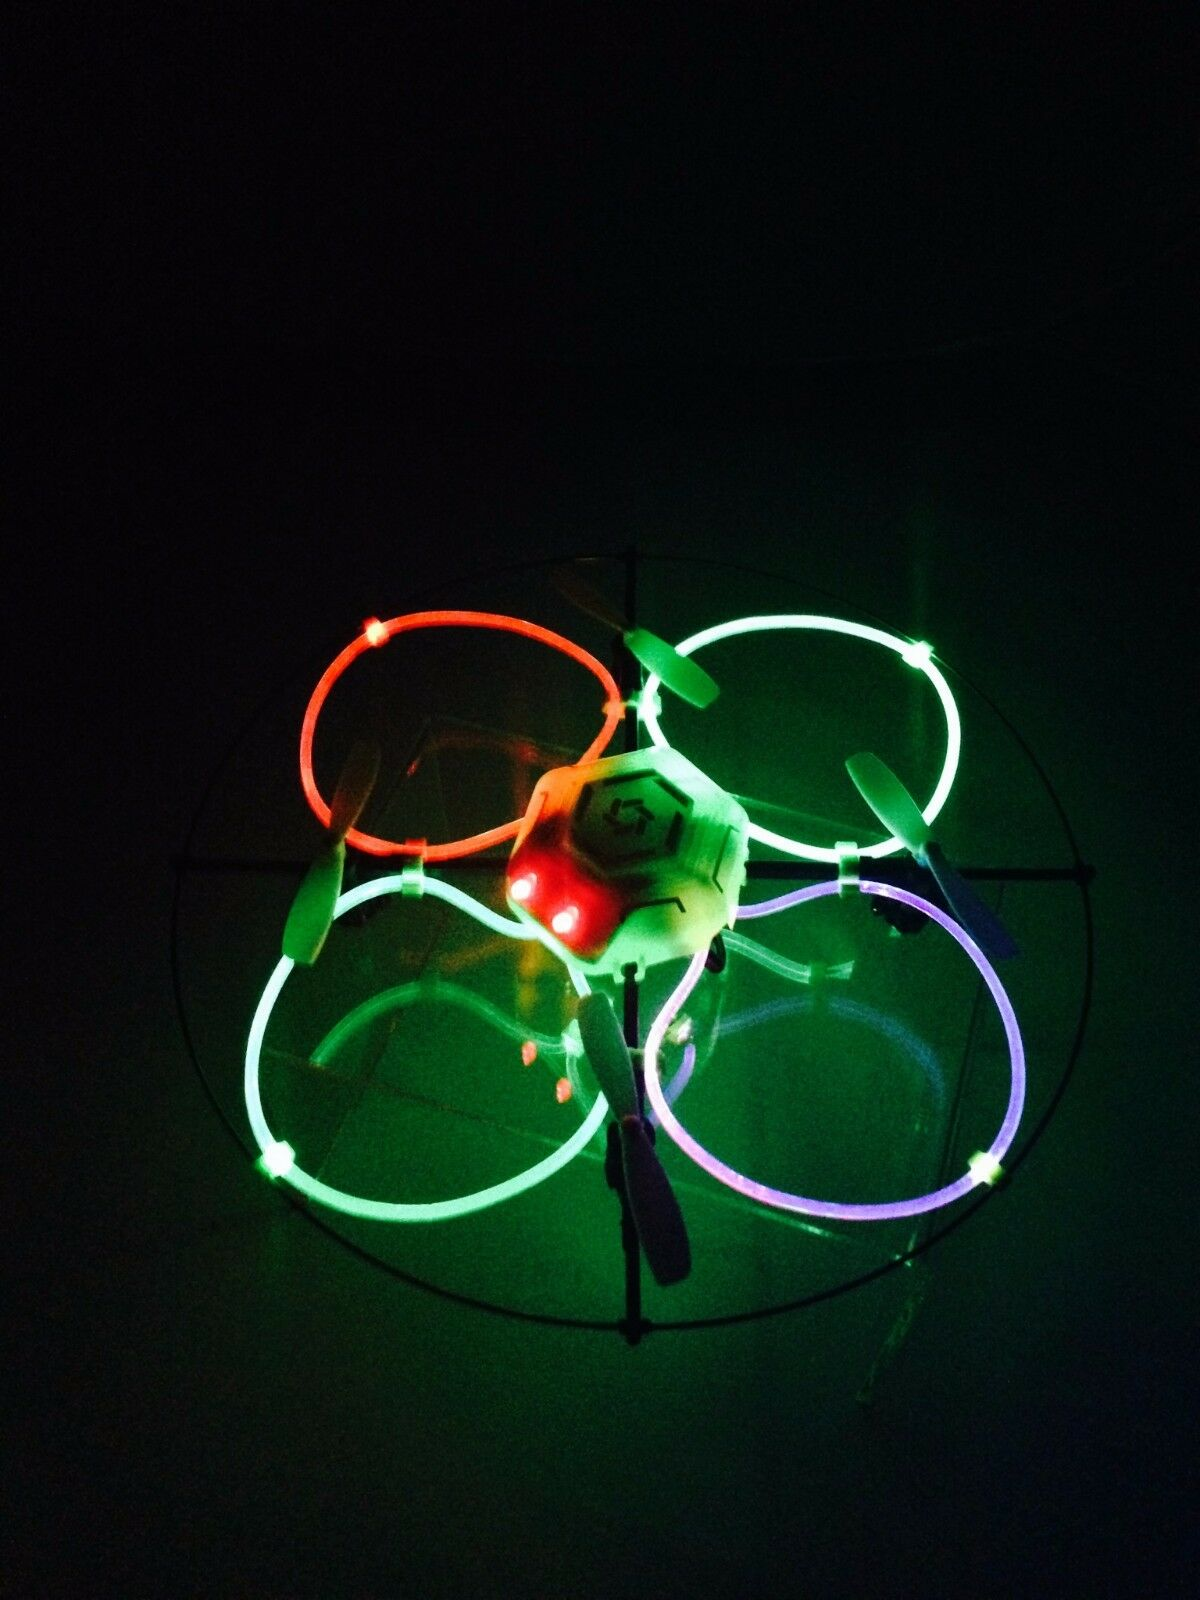 Odyssesy Sky Flyer NX RC Drone with LED Fiber Fiber Fiber Optic Lights 6e7d45